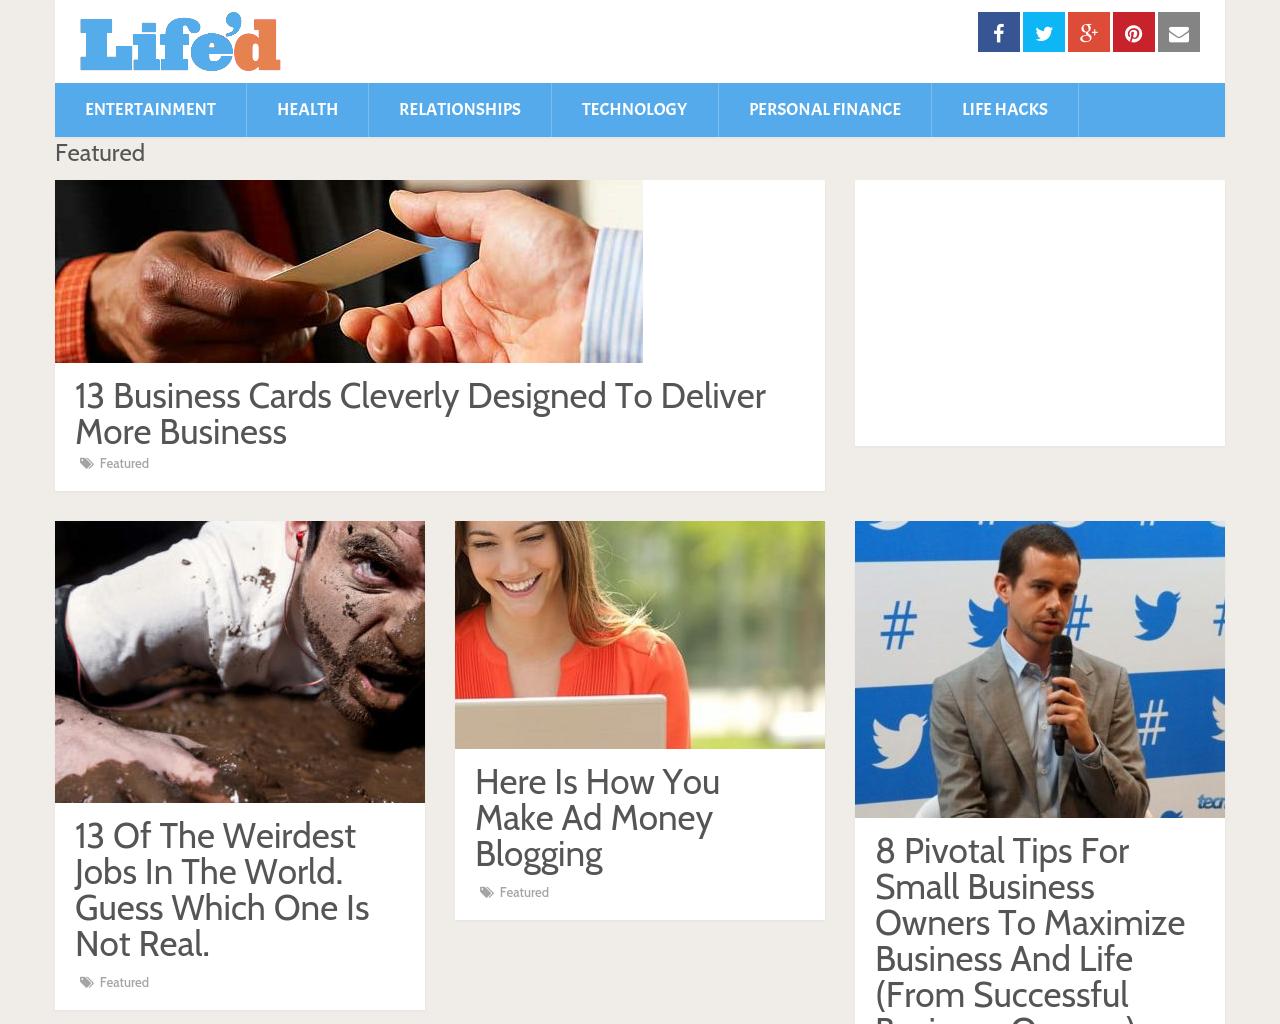 Life'd-Advertising-Reviews-Pricing